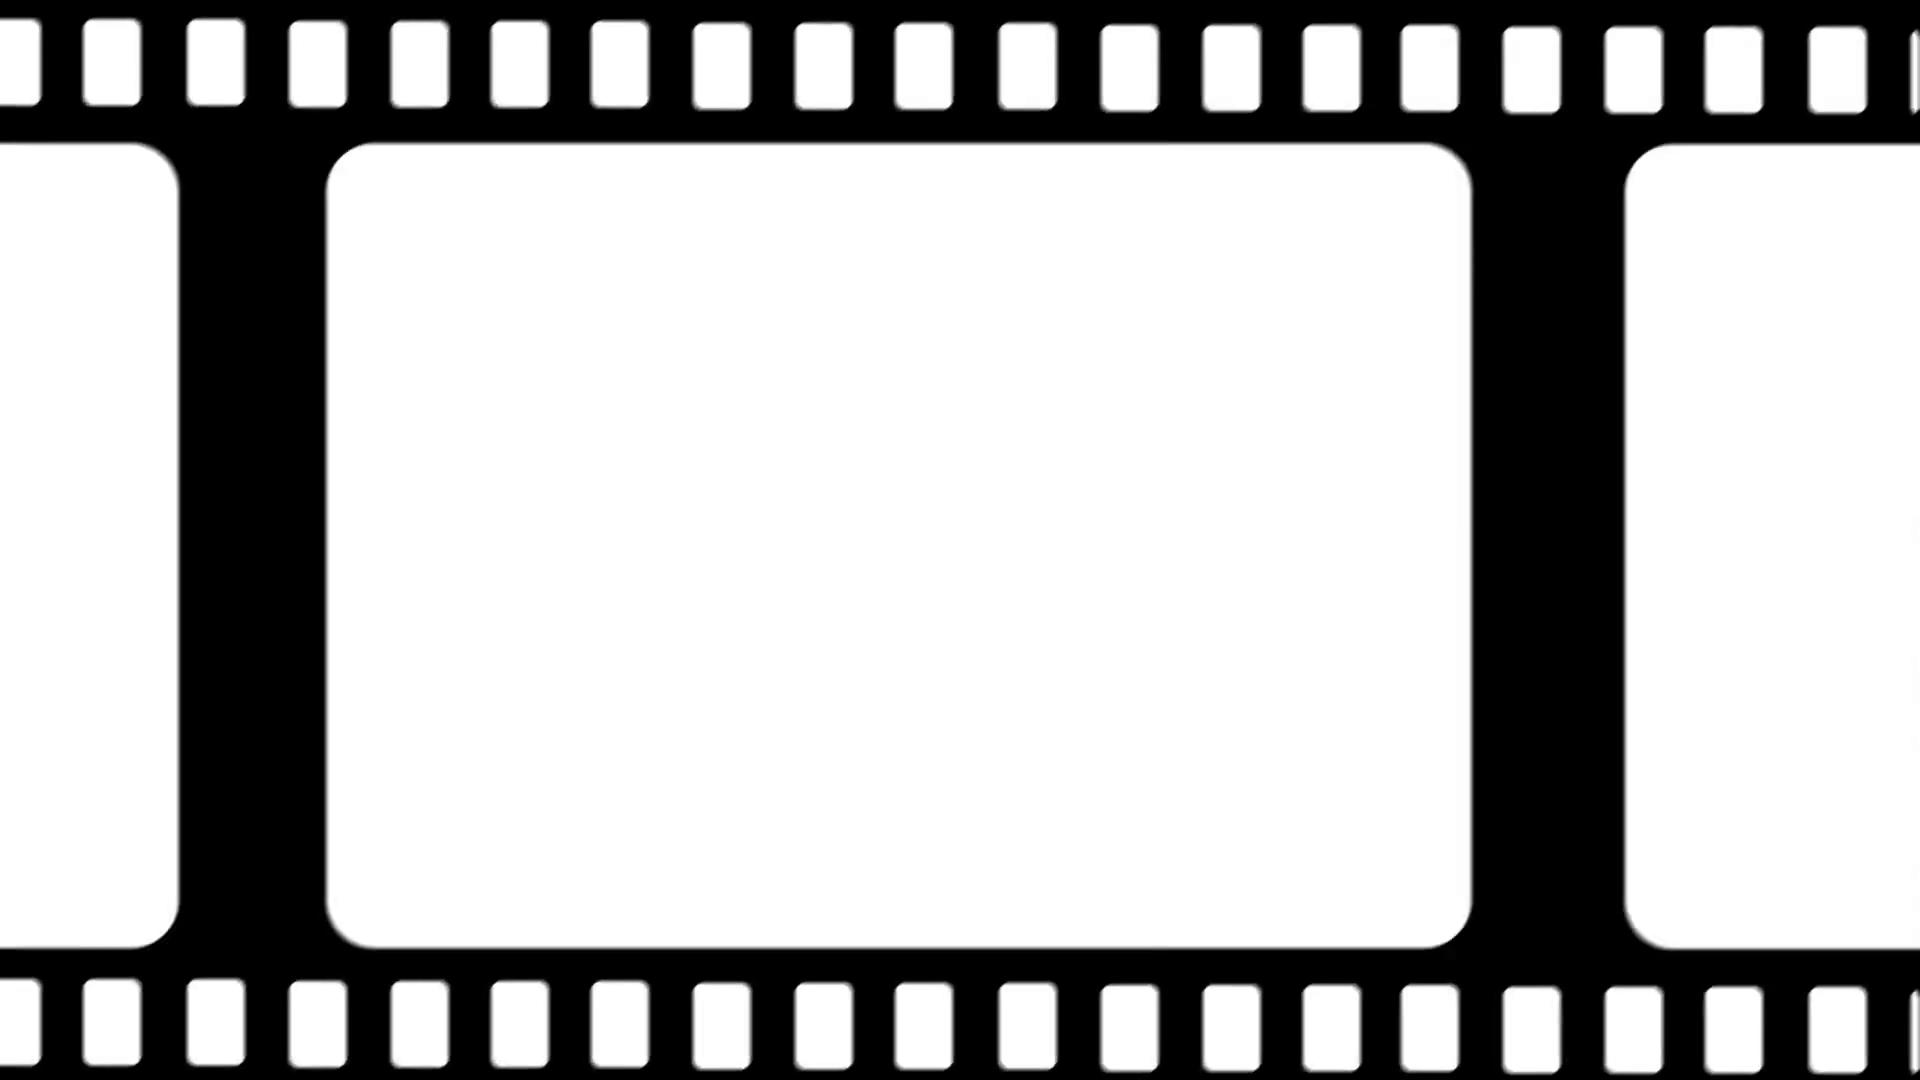 Film Reel PNG-PlusPNG pluspng.com-1920 - Film Reel PNG - Films PNG HD